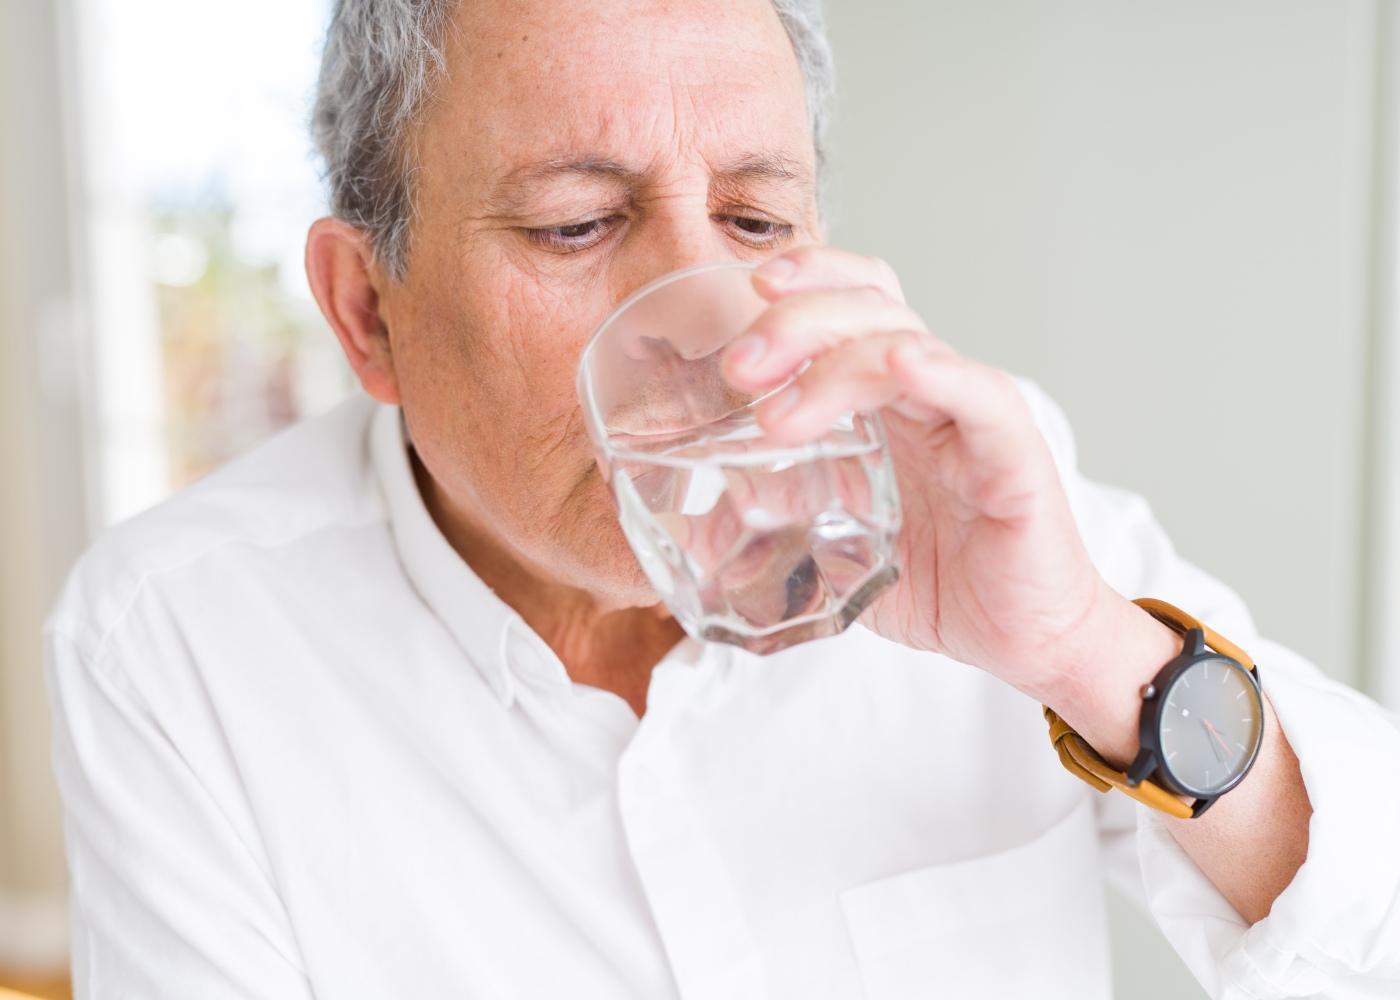 Homem a beber água